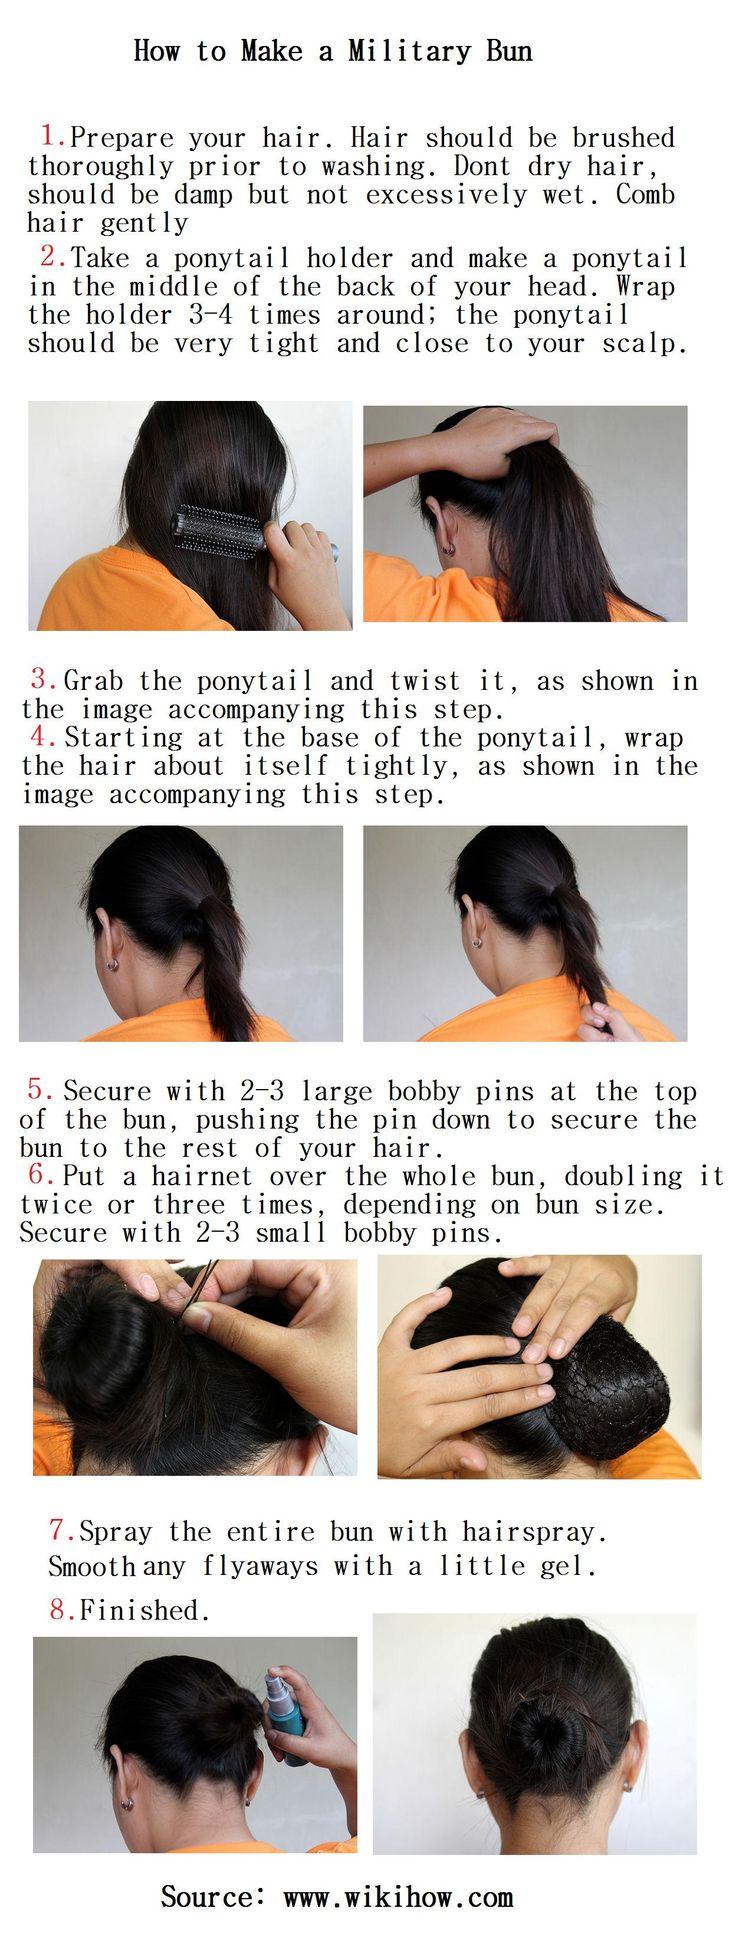 How to Make a Military Bun